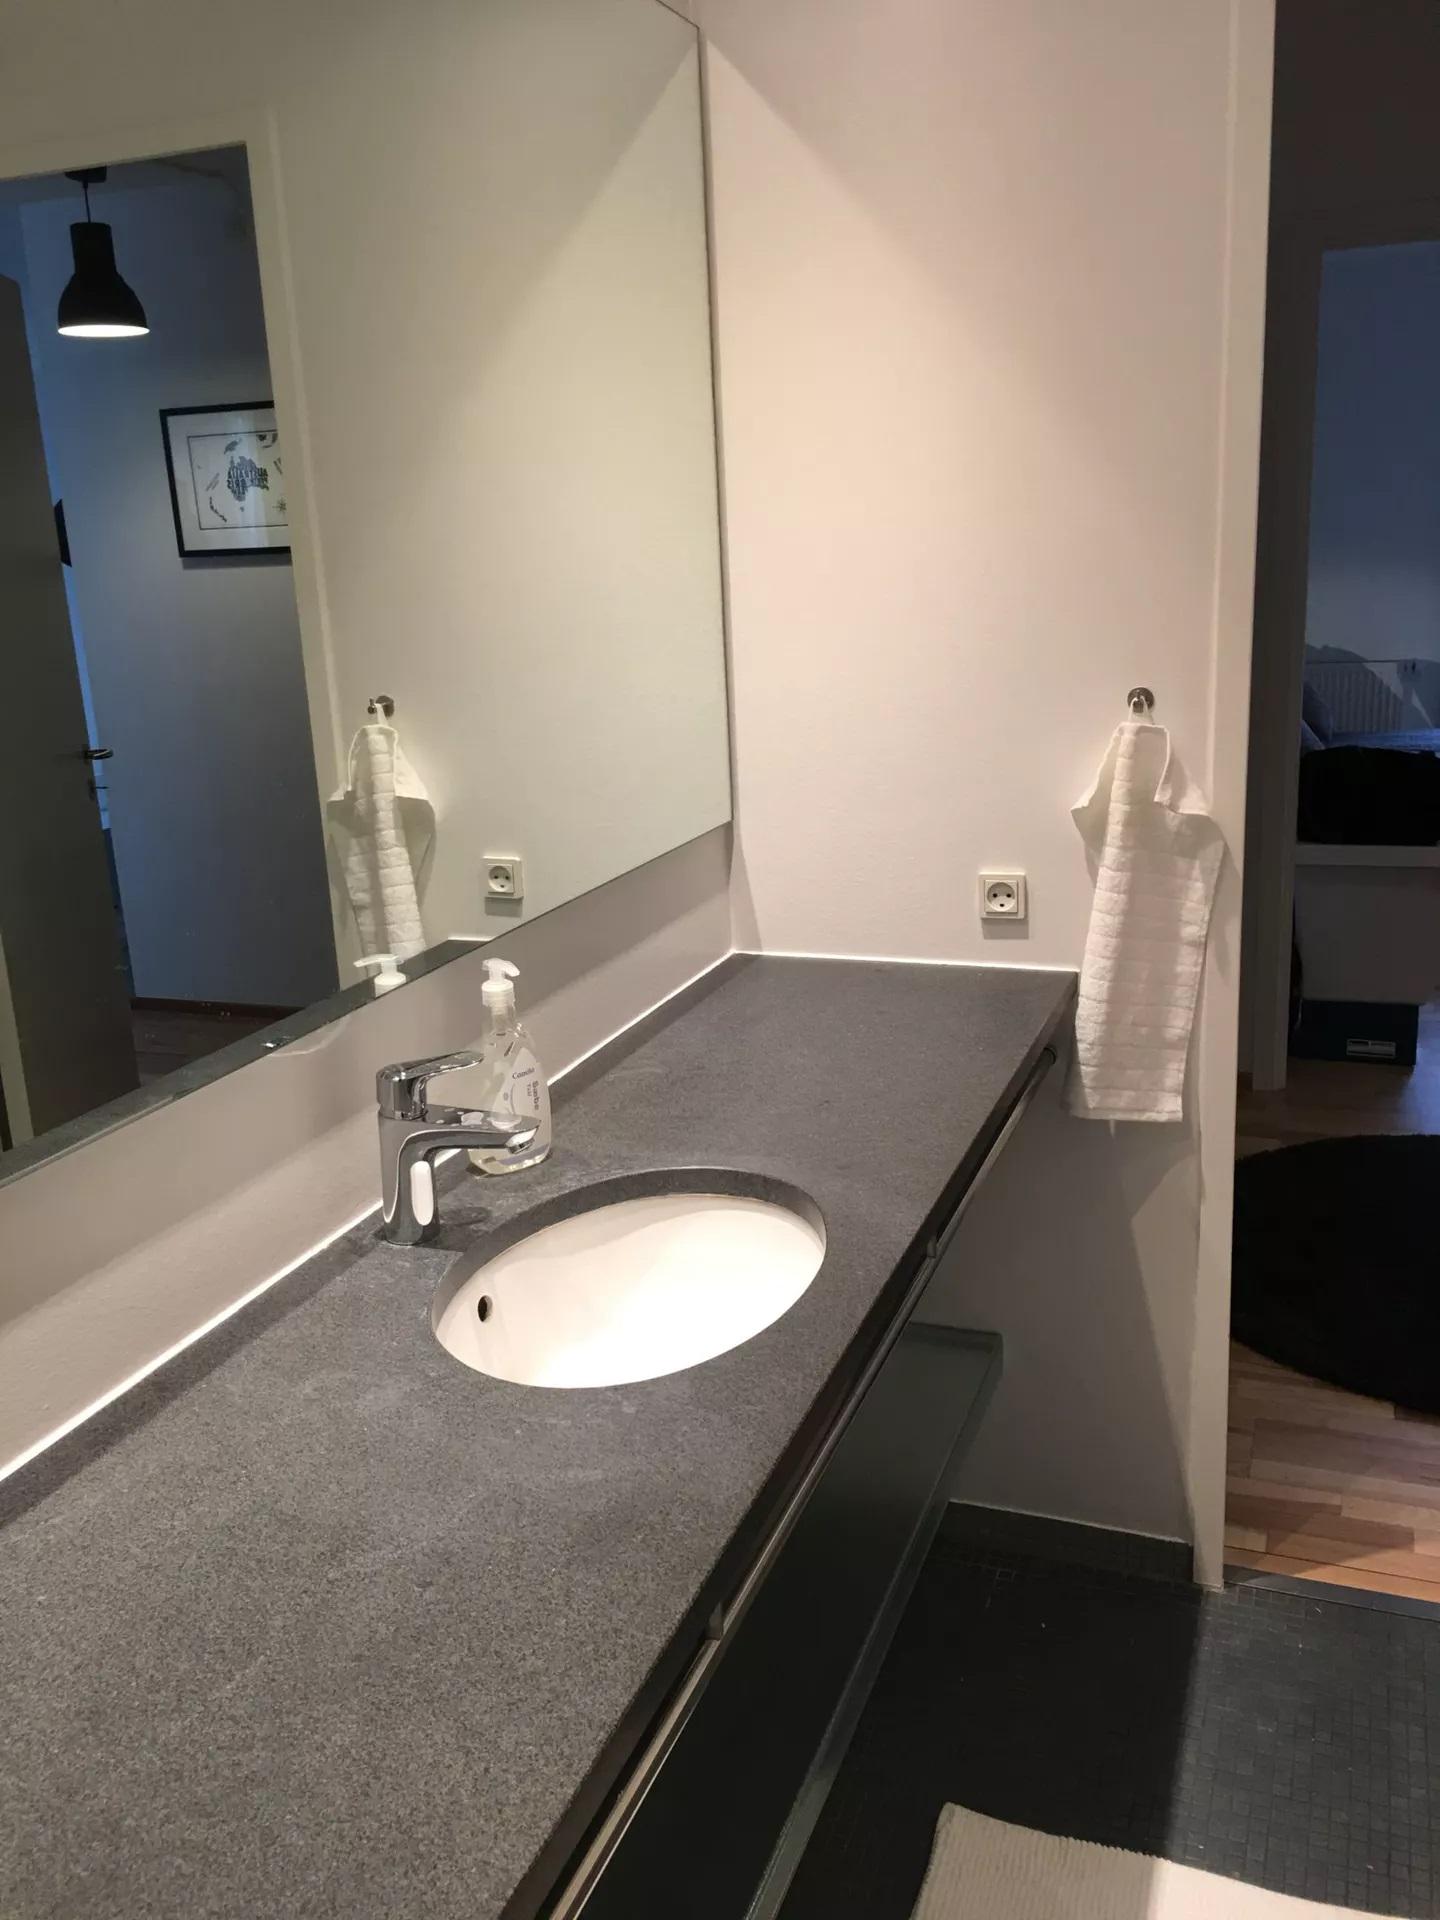 Sink at Teglholm Apartment, Sydhavnen, Copenhagen